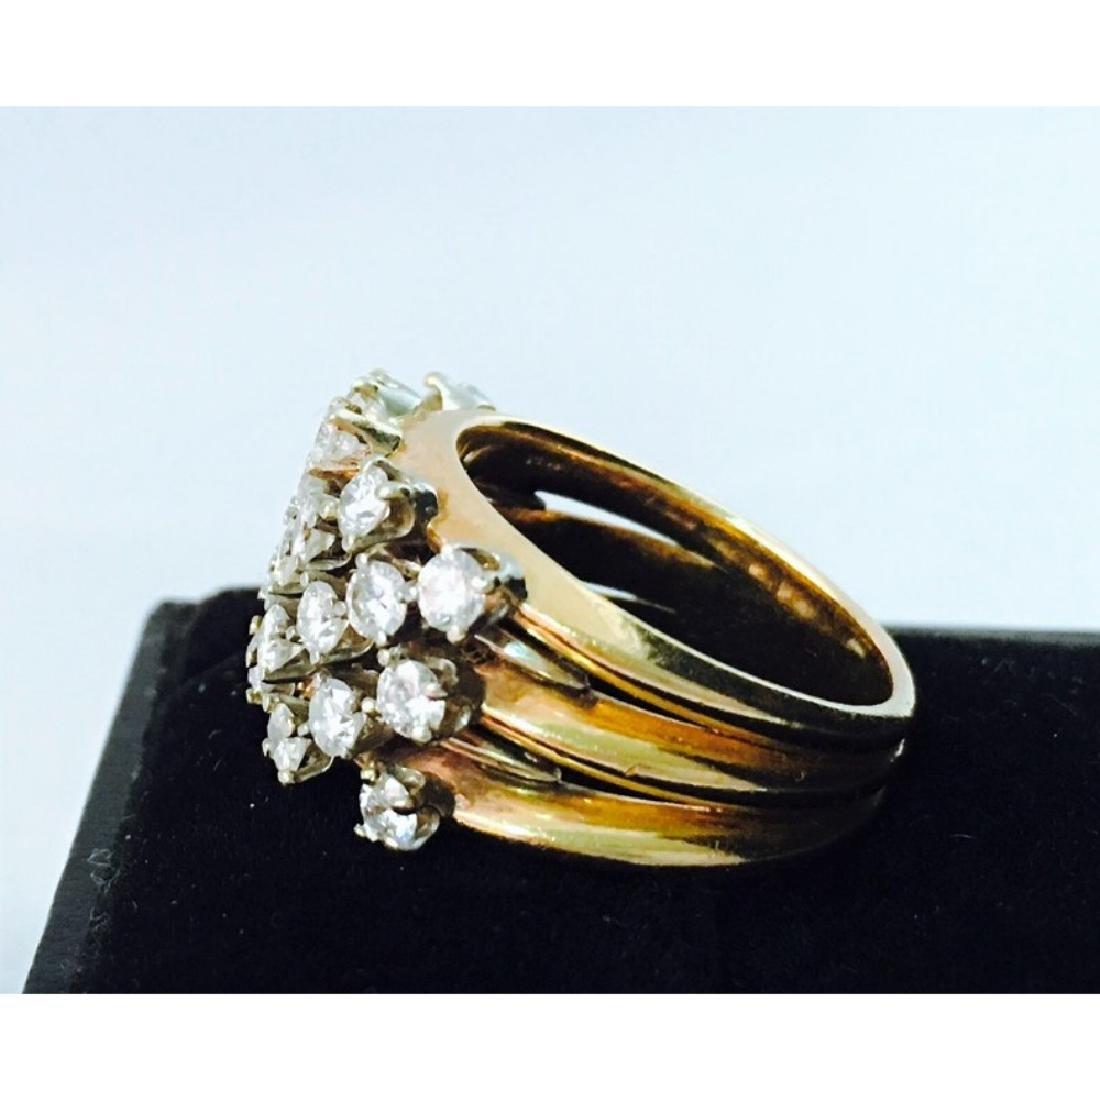 14k Gold, White Diamond Cocktail Ring - 2